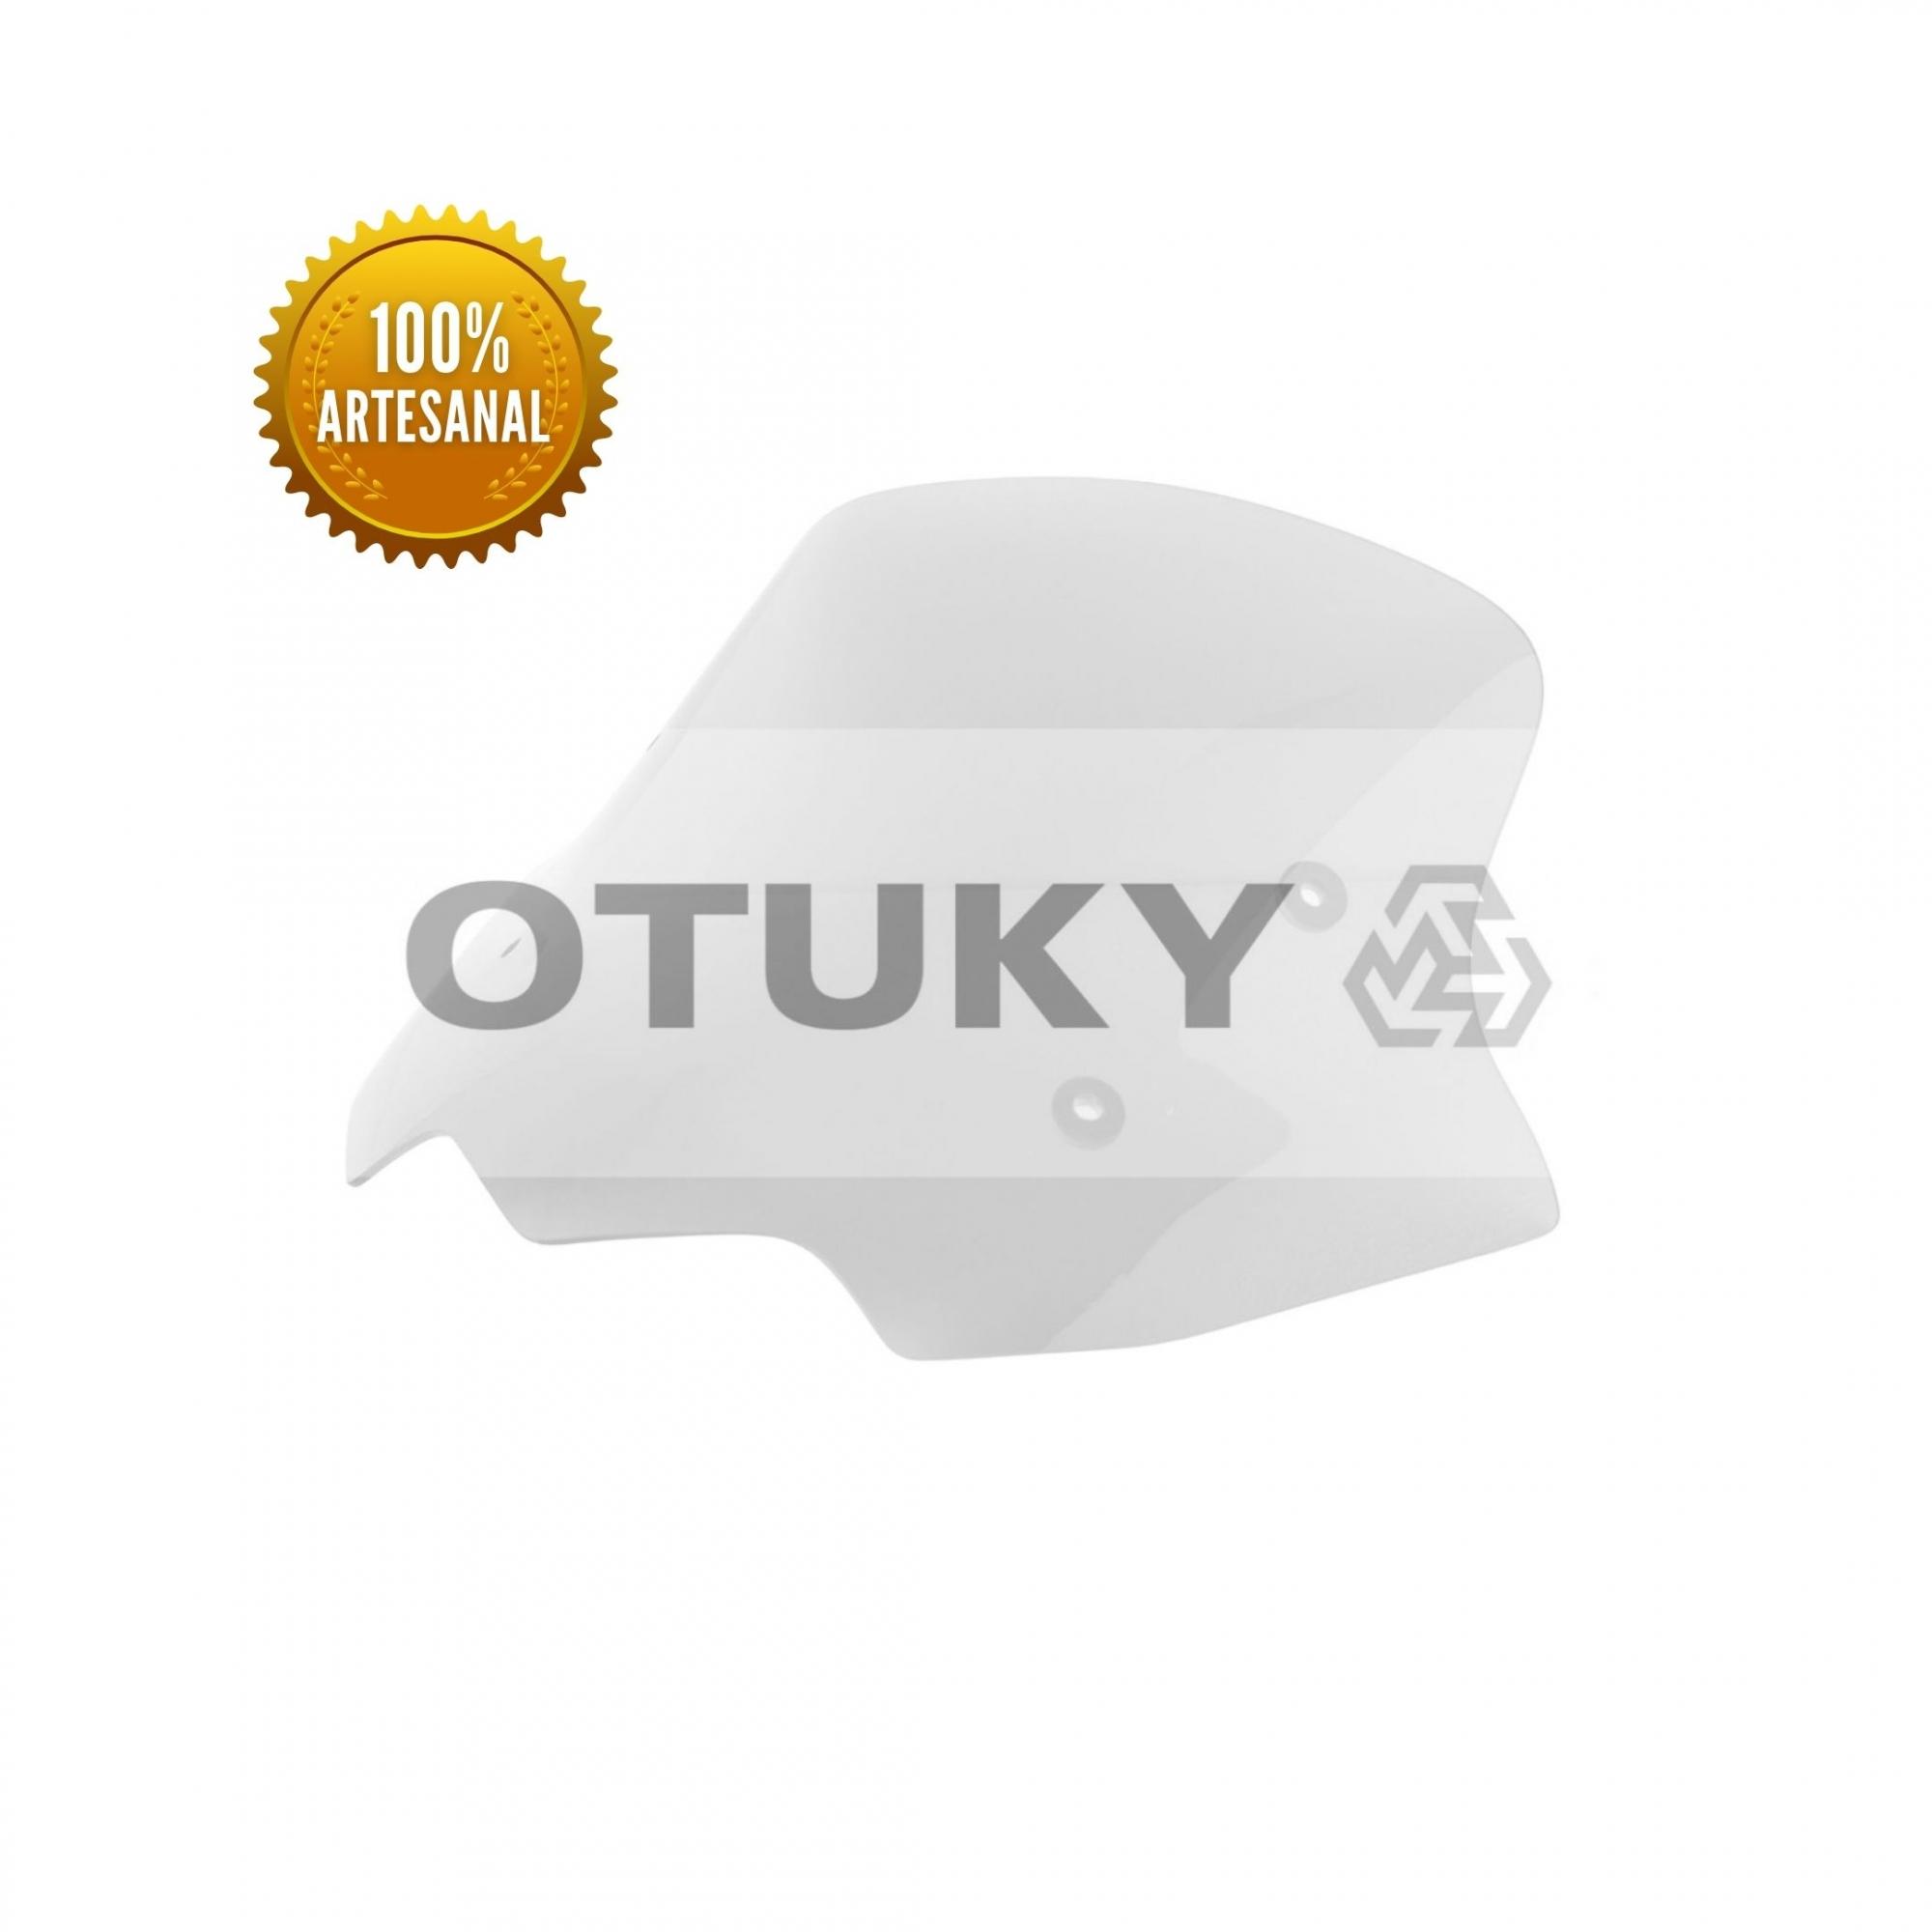 Bolha para Moto CB 500 X 2014 2015 2016 2017 Otuky Padrão Cristal